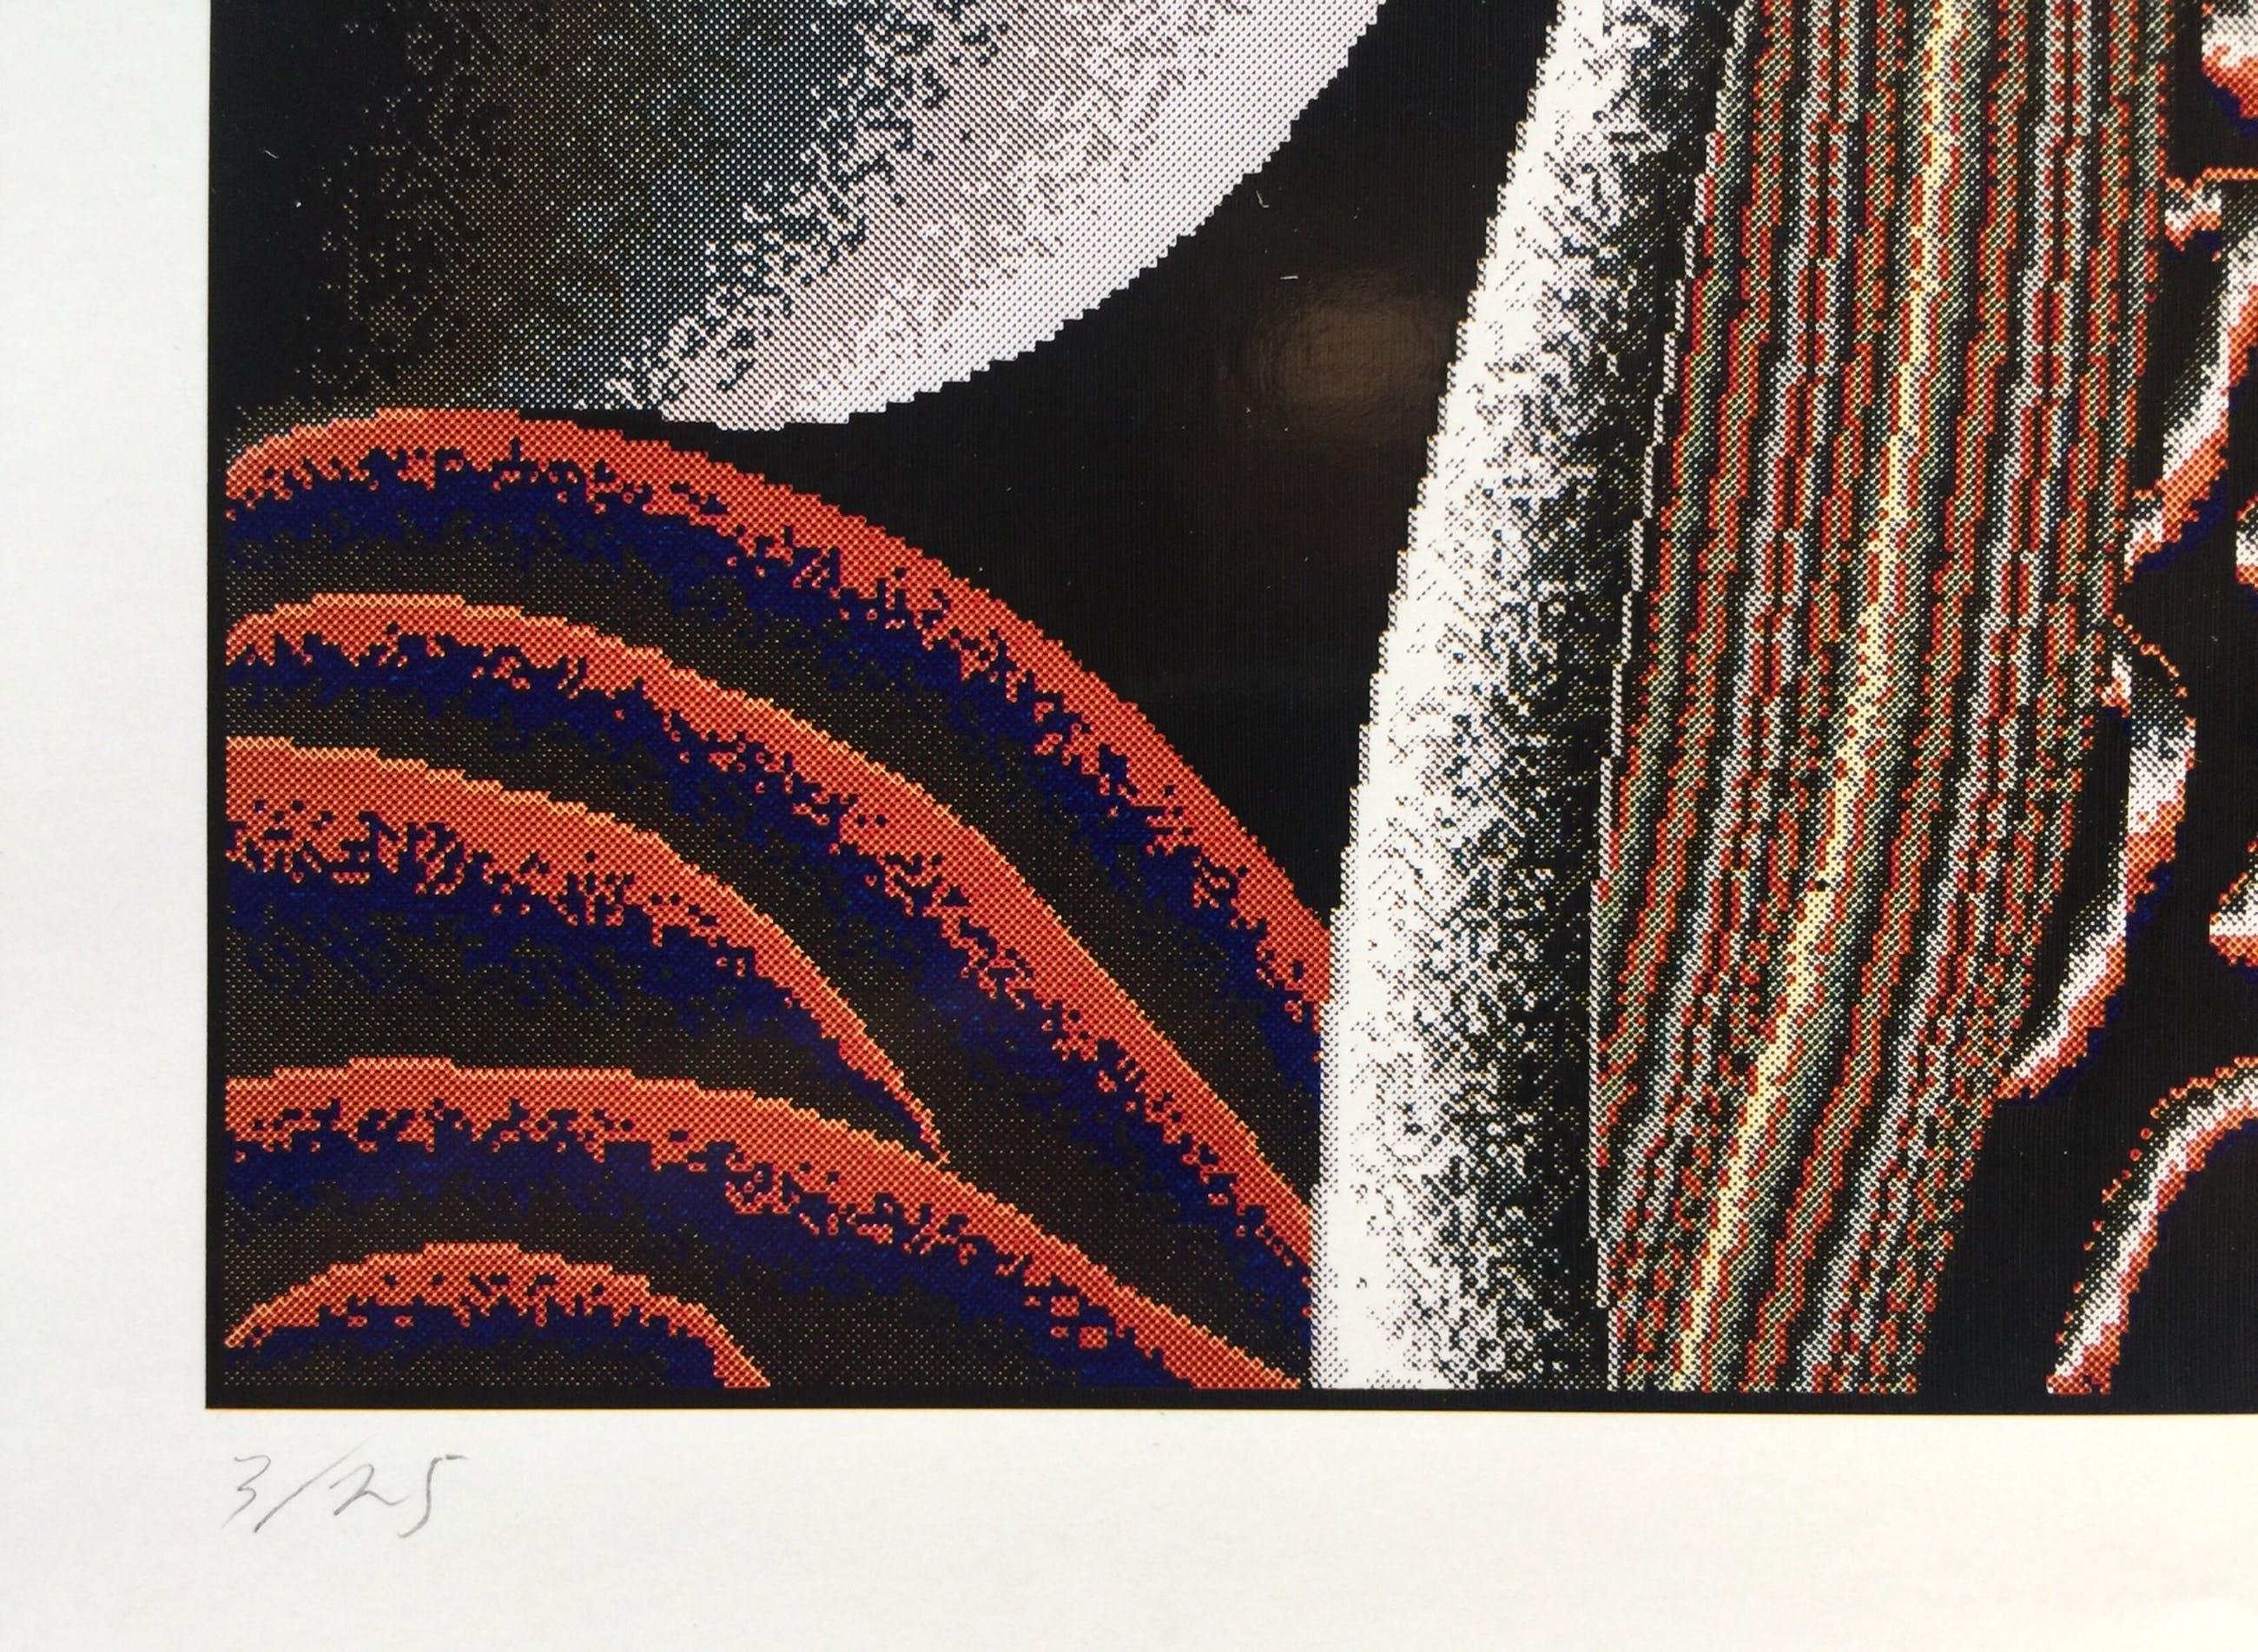 Shinkichi Tajiri - zeldzame knoop - gesigneerde computerprint - incl. originele bewaarmap kopen? Bied vanaf 150!